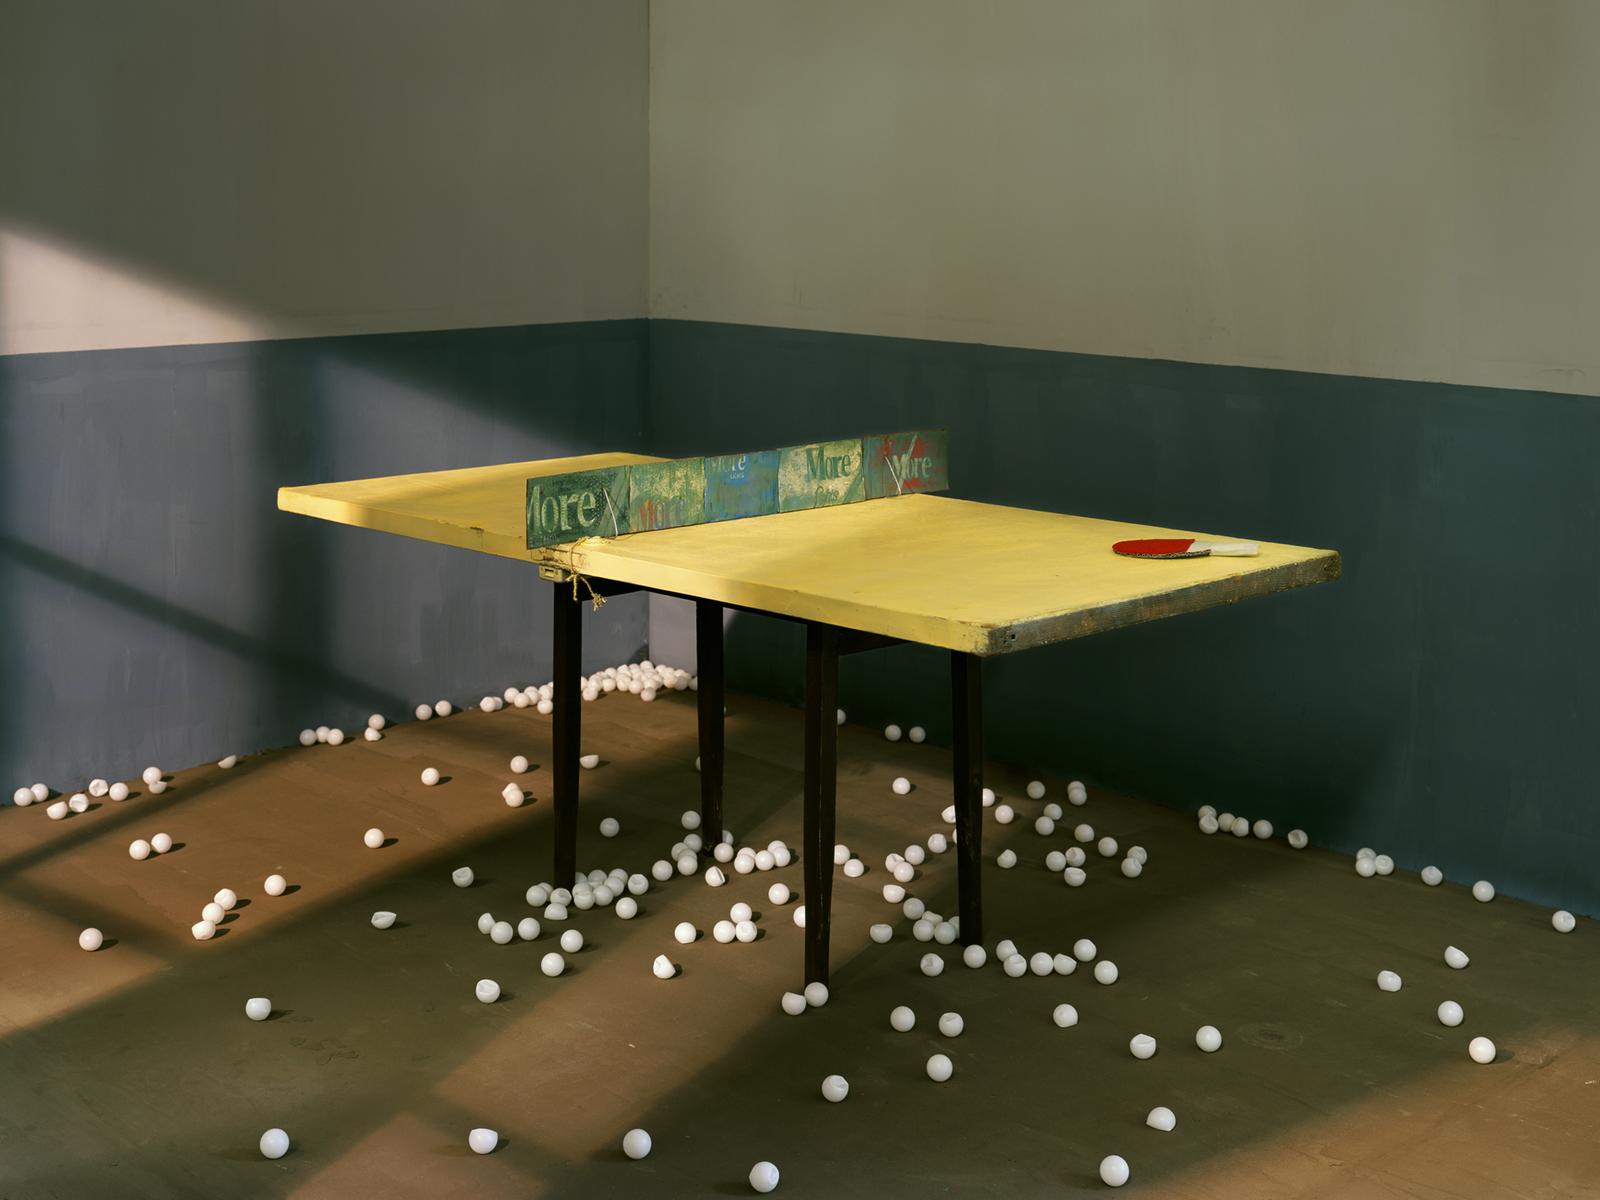 Chen Wei 陈维, Ping Pong, 2011, Archival inkjet print 收藏级艺术微喷, 150 x 200 cm